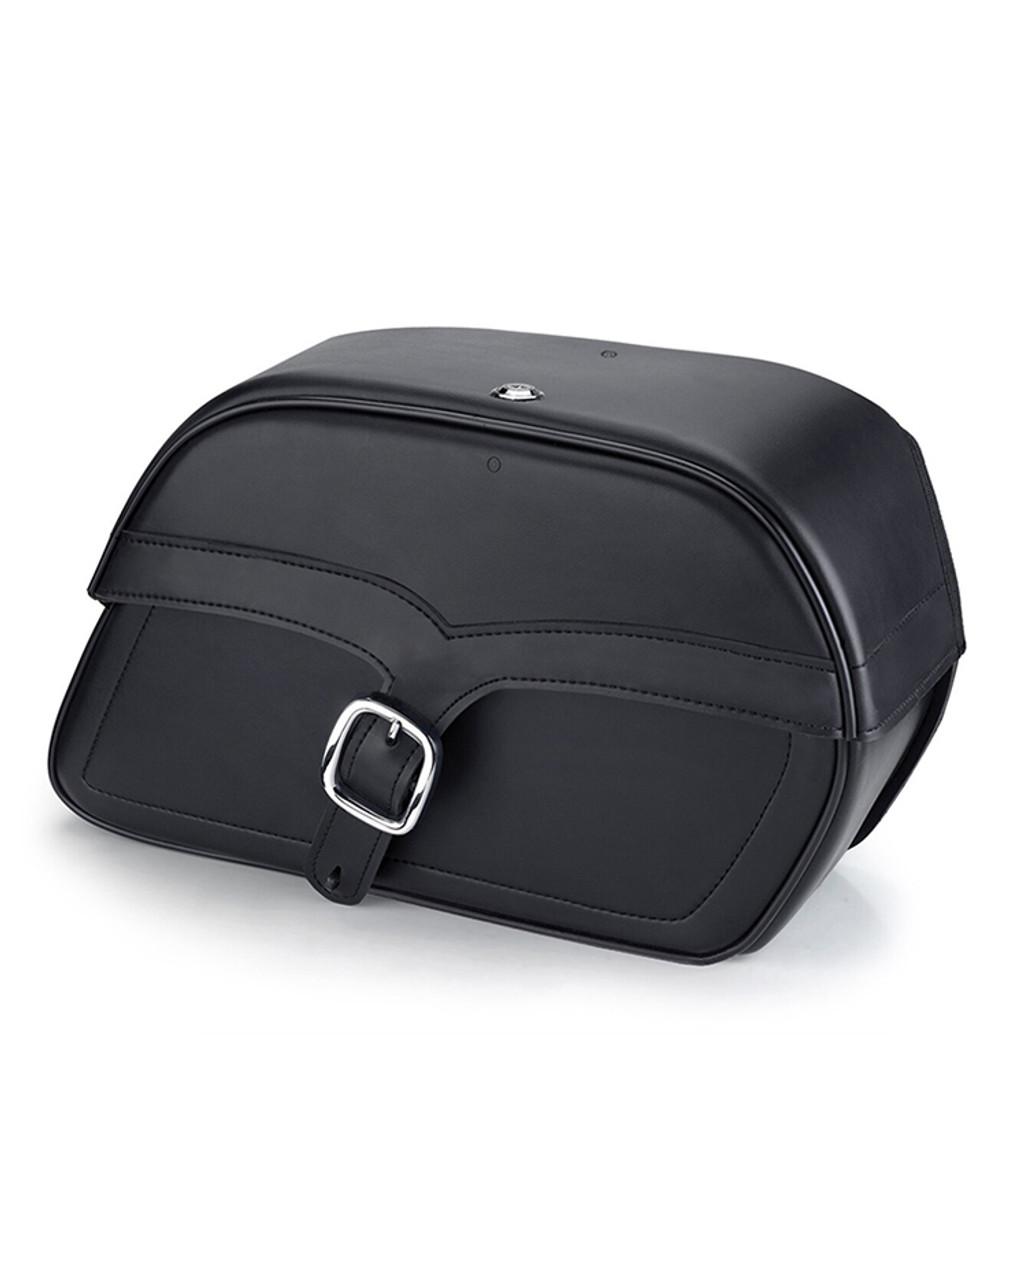 Victory Judge Charger Single Strap Large Motorcycle Saddlebags Main Bag View